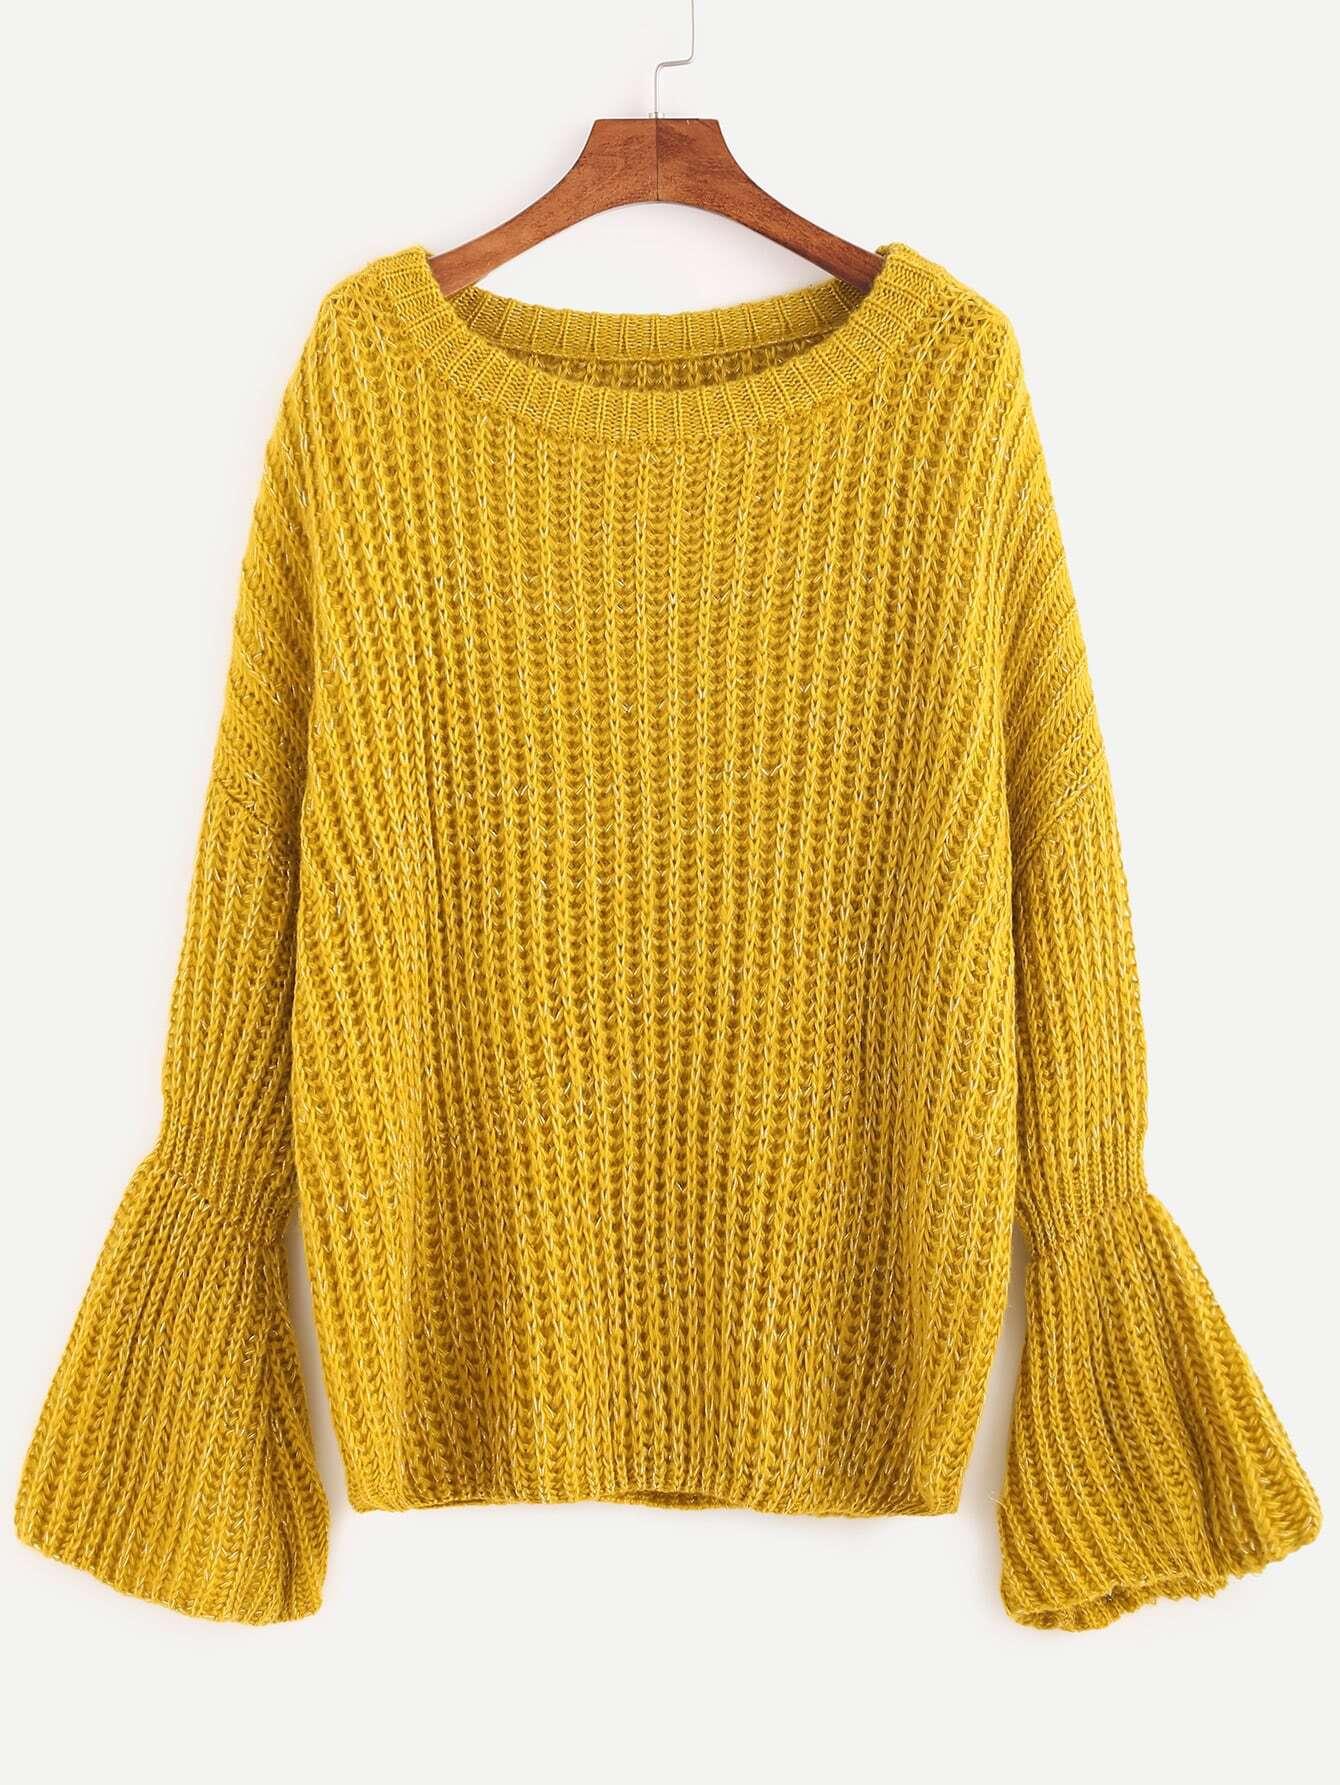 sweater160920461_2